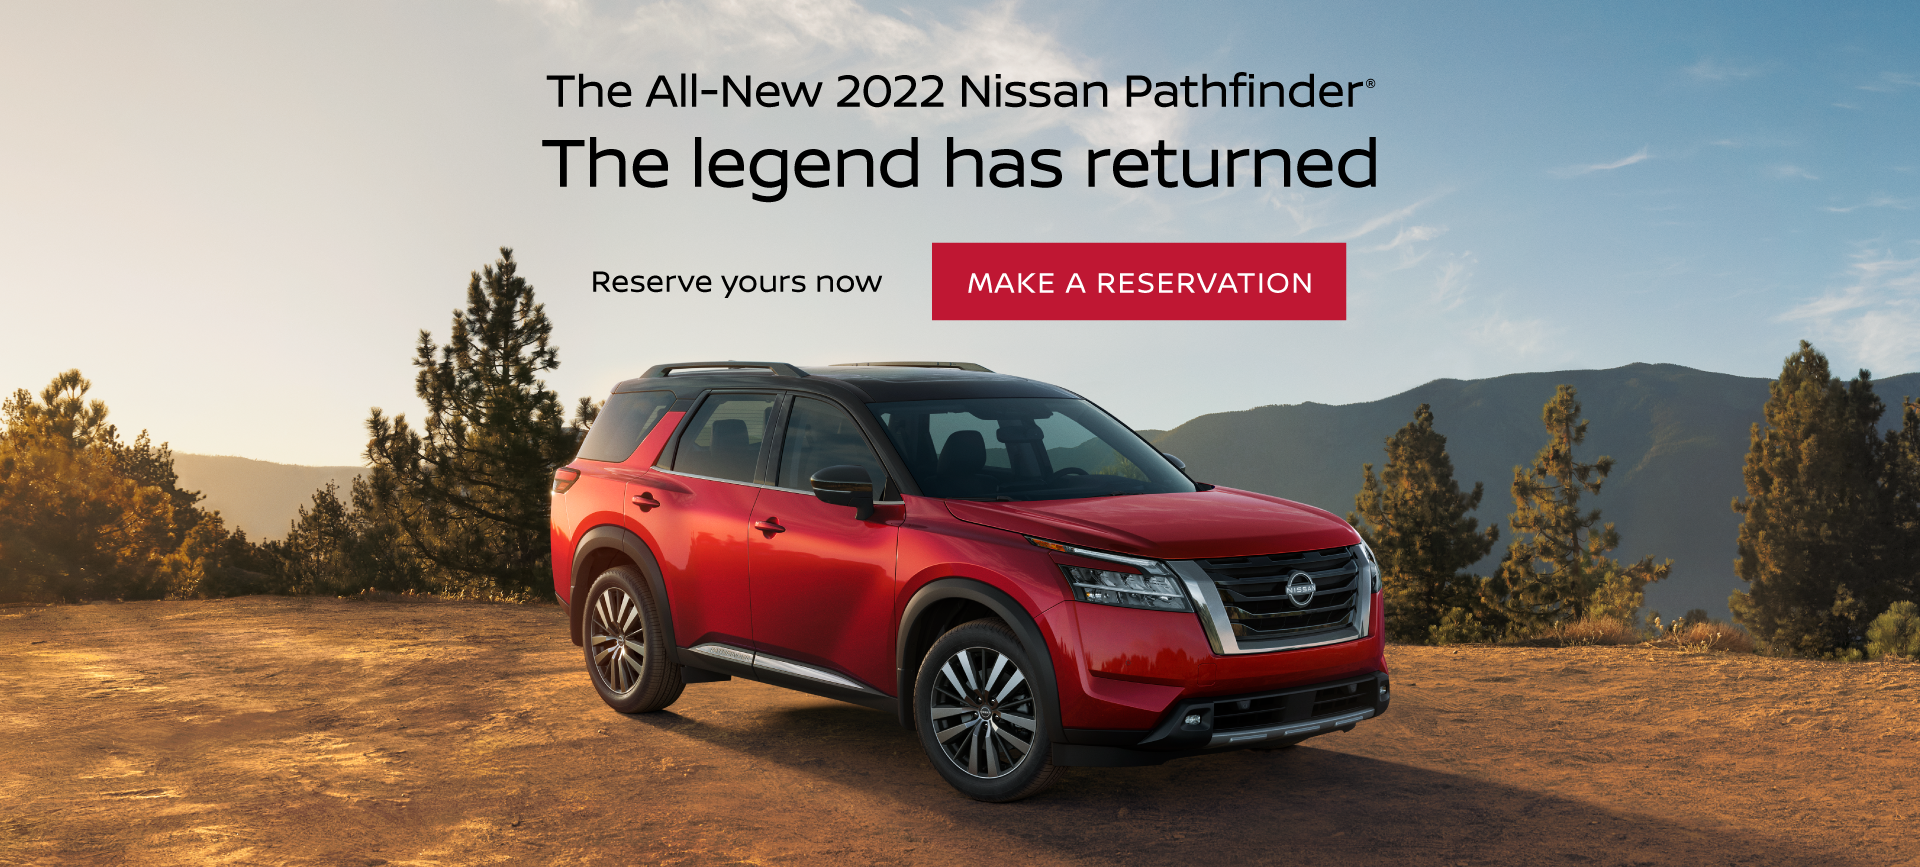 Nissan-Place-OEM-0721_Pathfinder